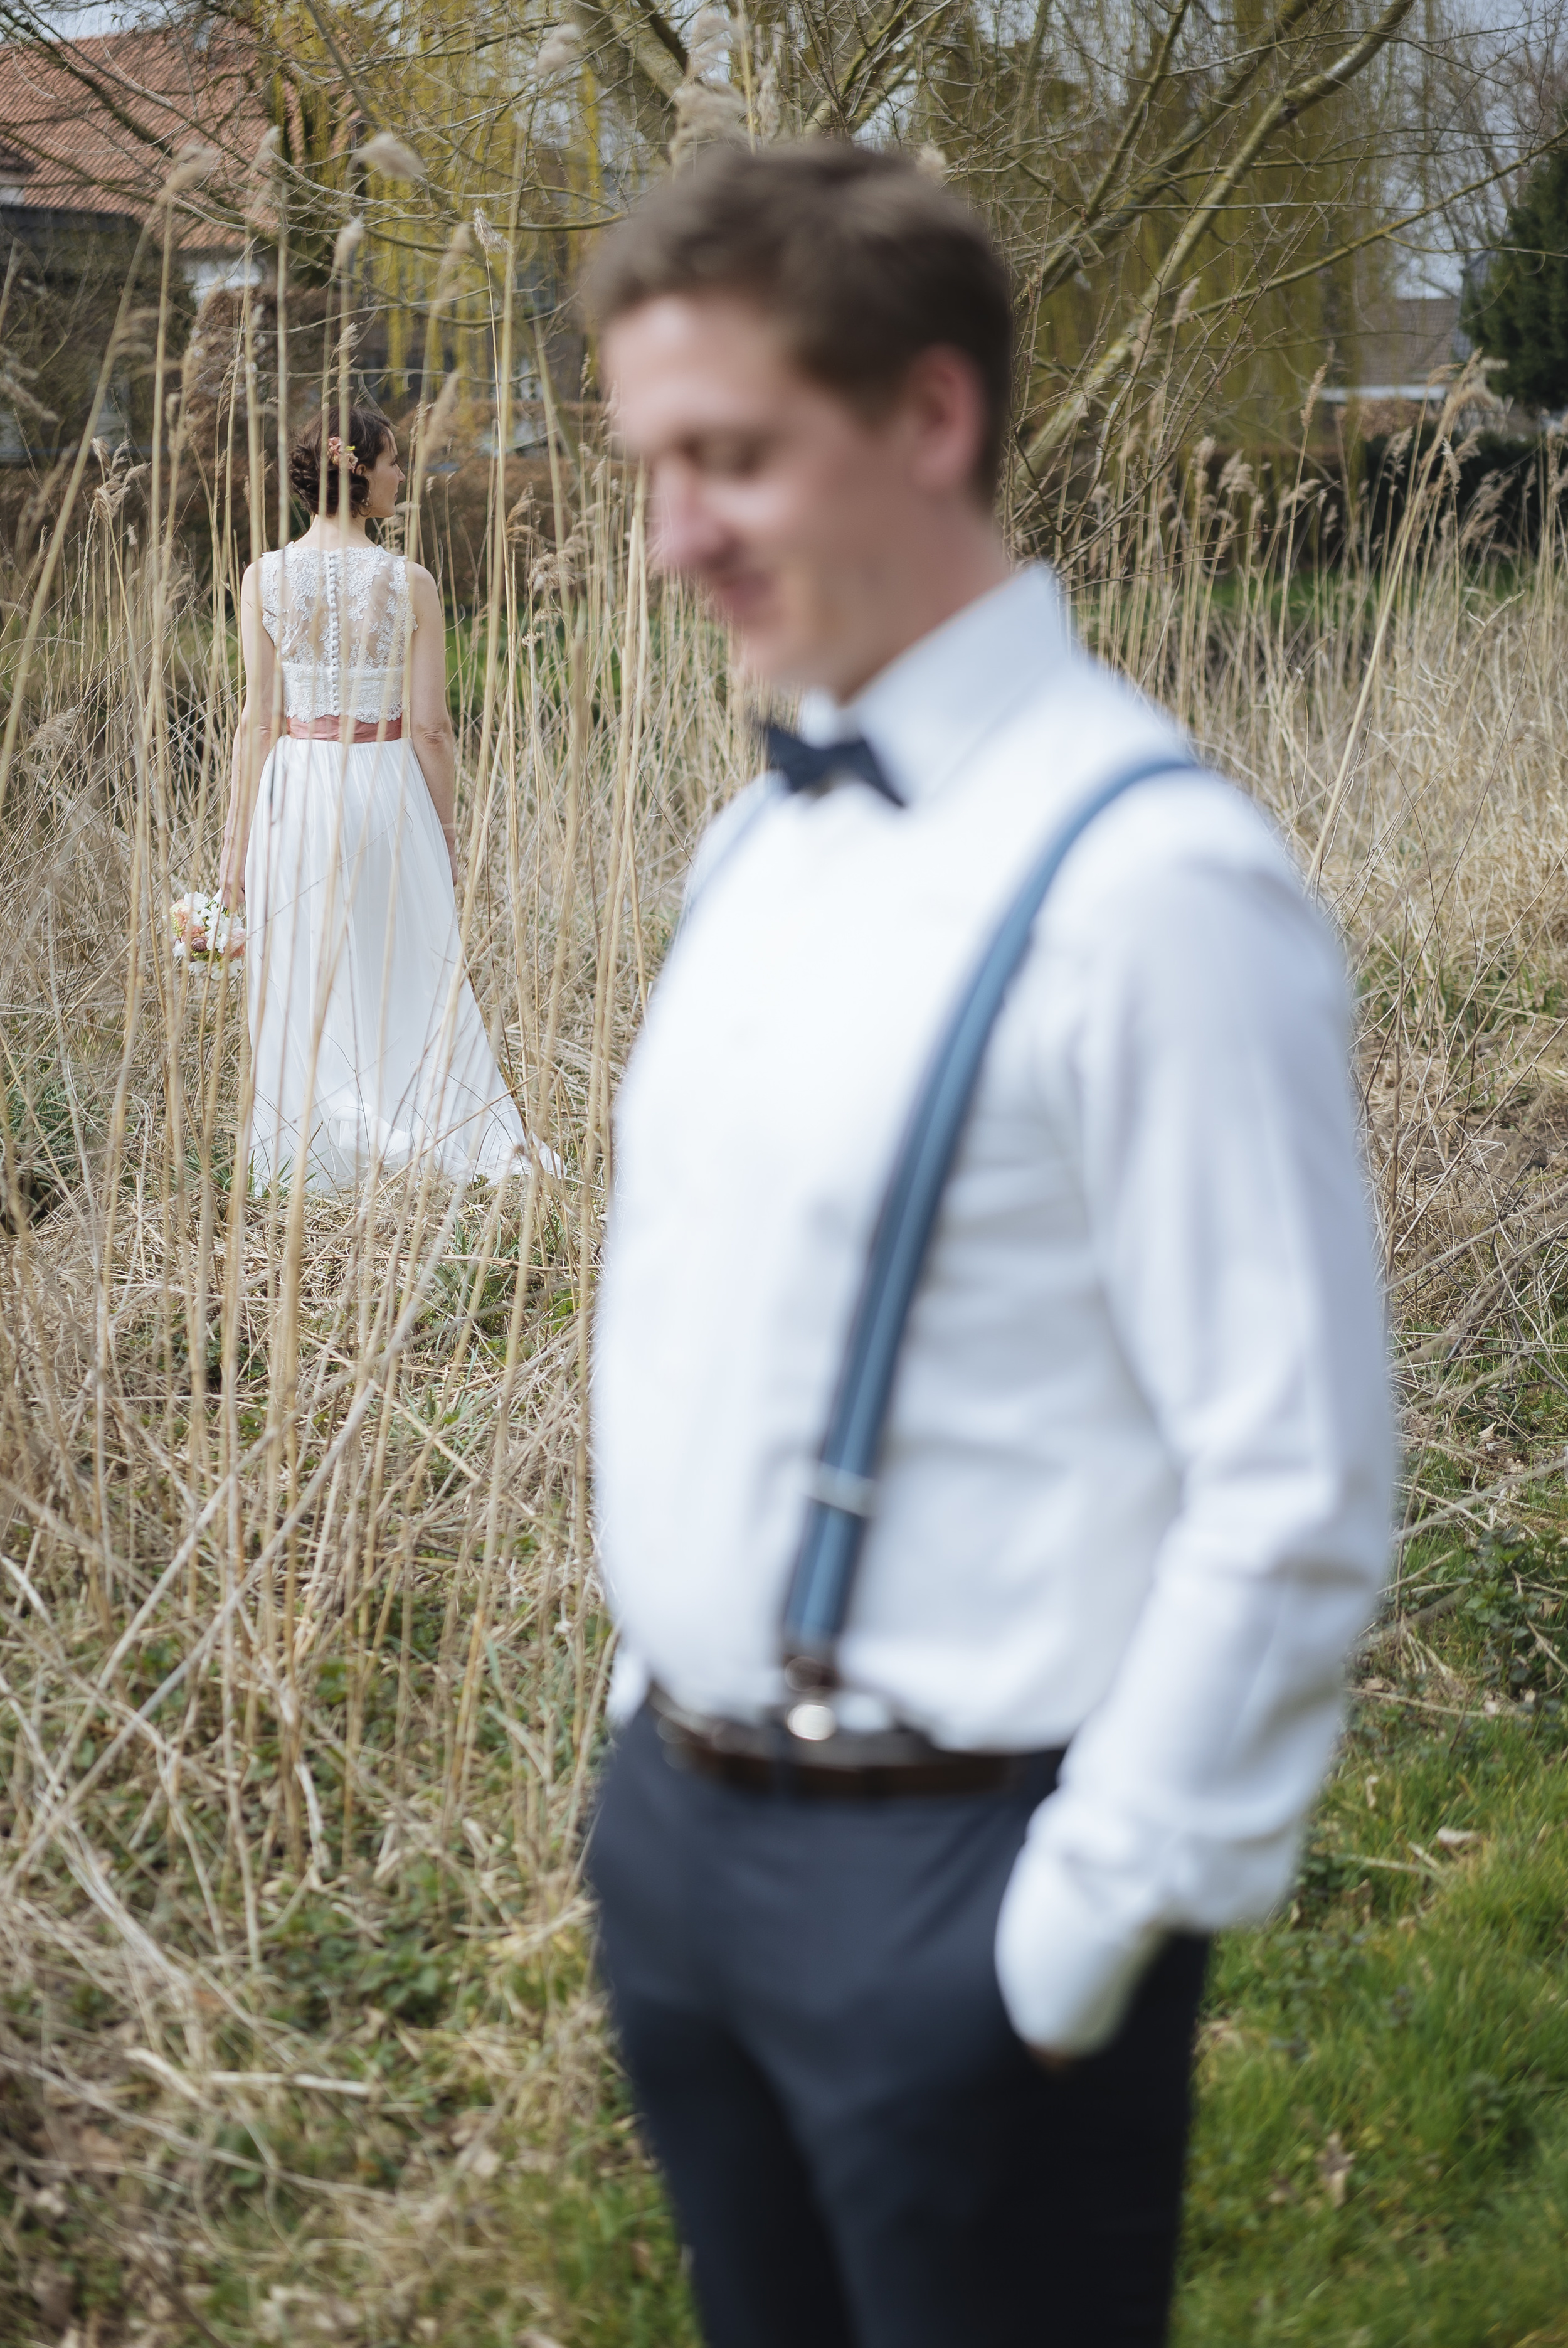 Hochzeitsfotograf-Schlossruine-Hertefeld-Weeze-033.jpg